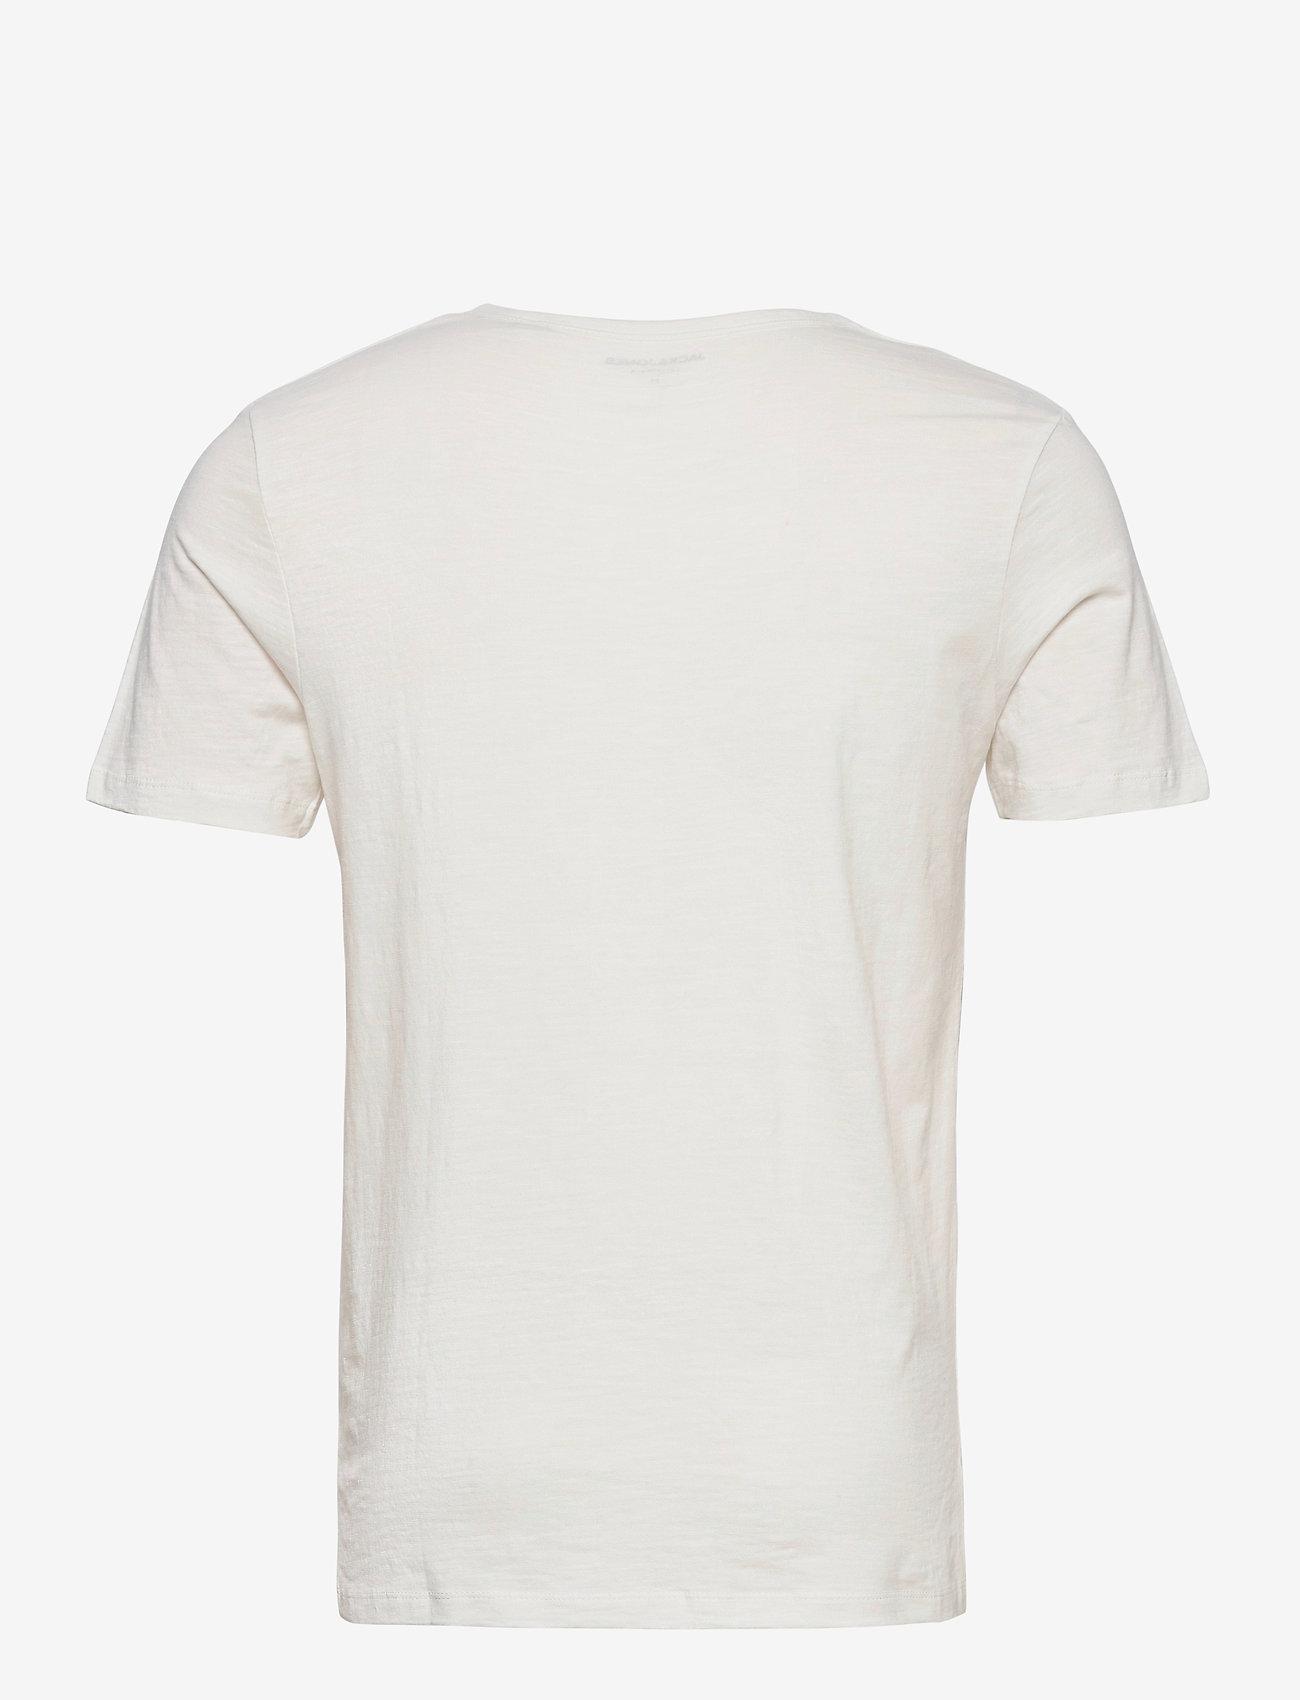 Jack & Jones - JJESPLIT NECK TEE SS - kortärmade t-shirts - cloud dancer - 1